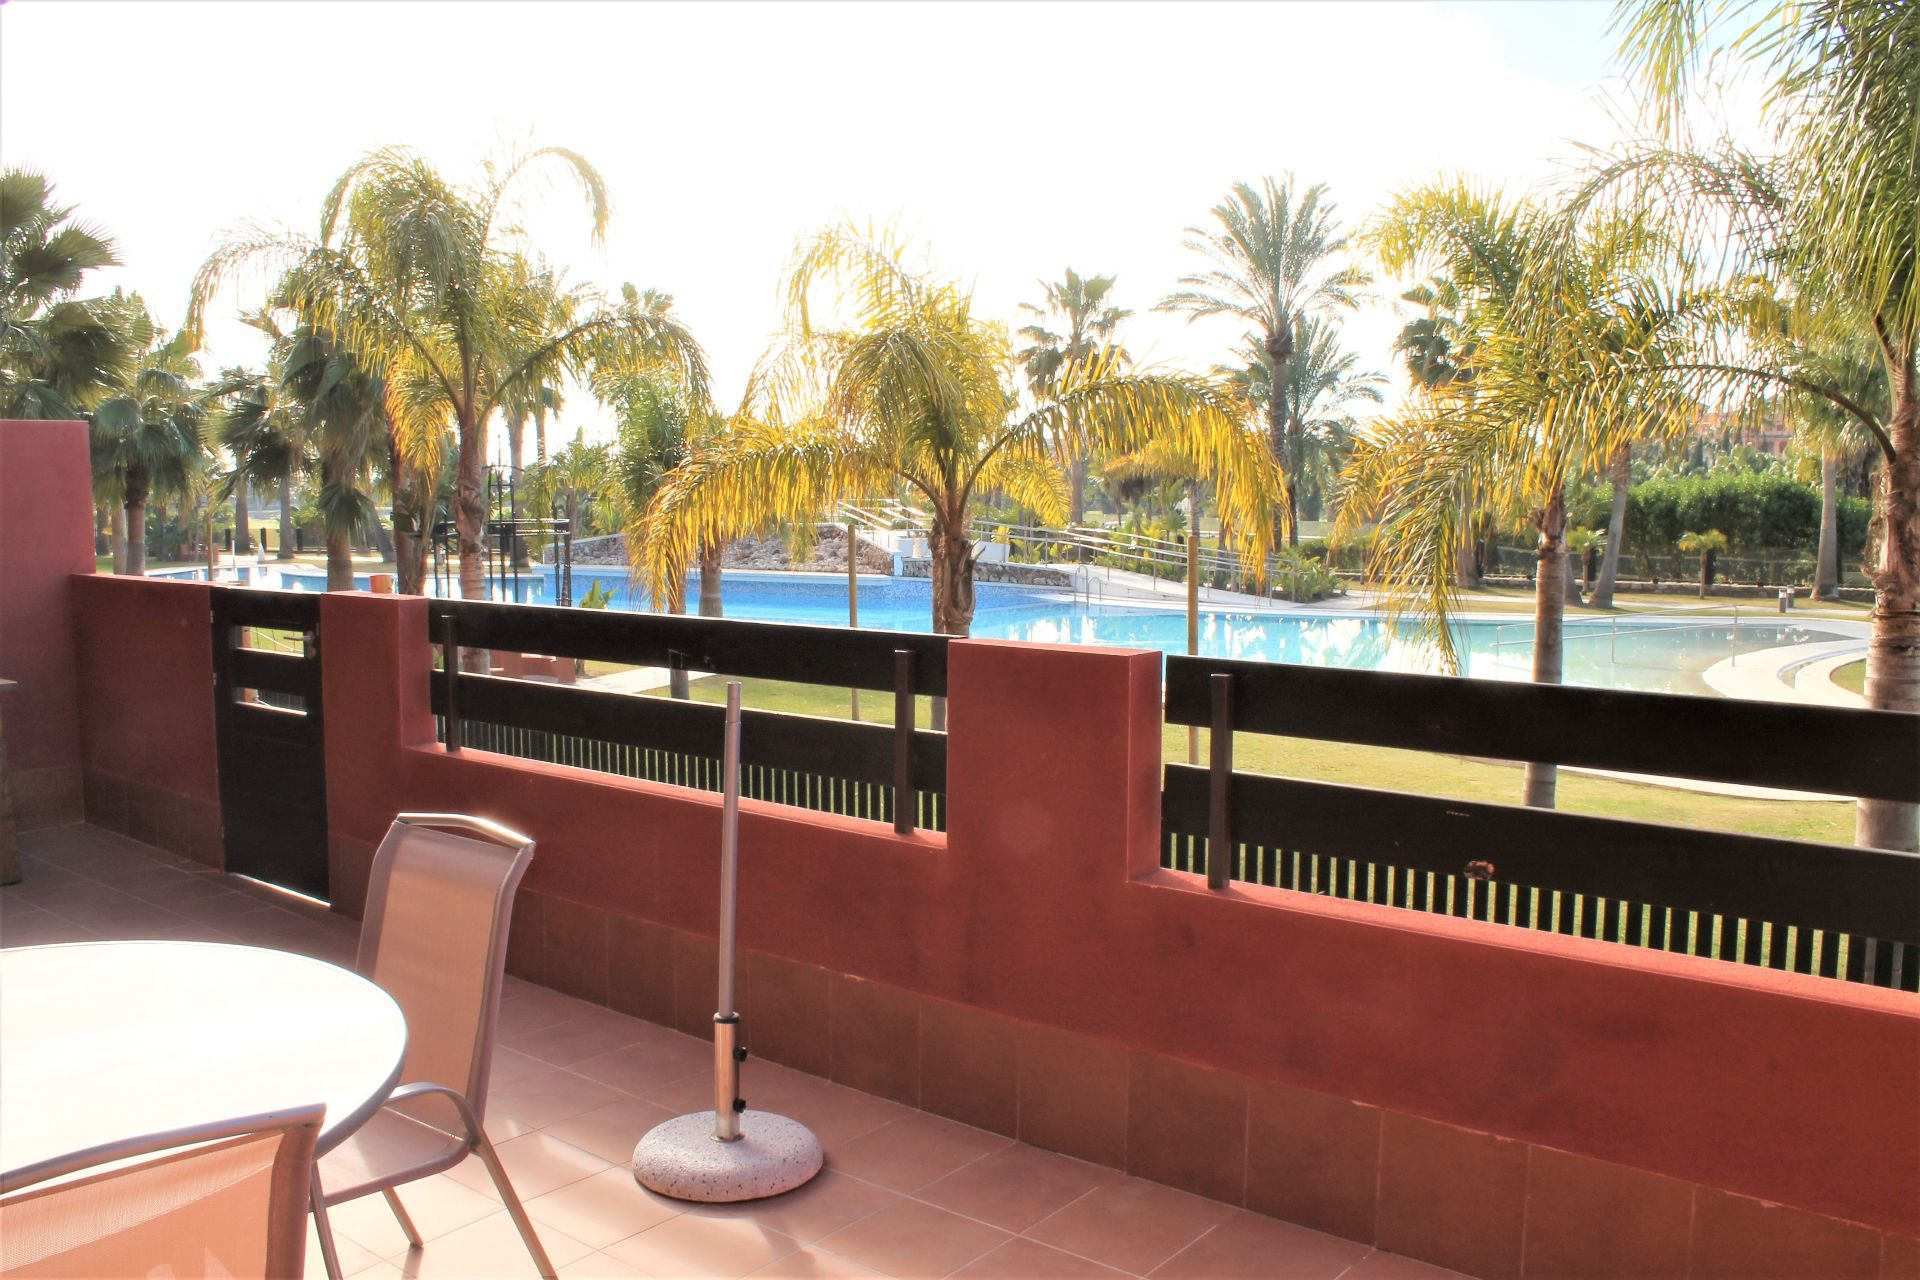 Piso en Motril, Playa Granada, alquiler